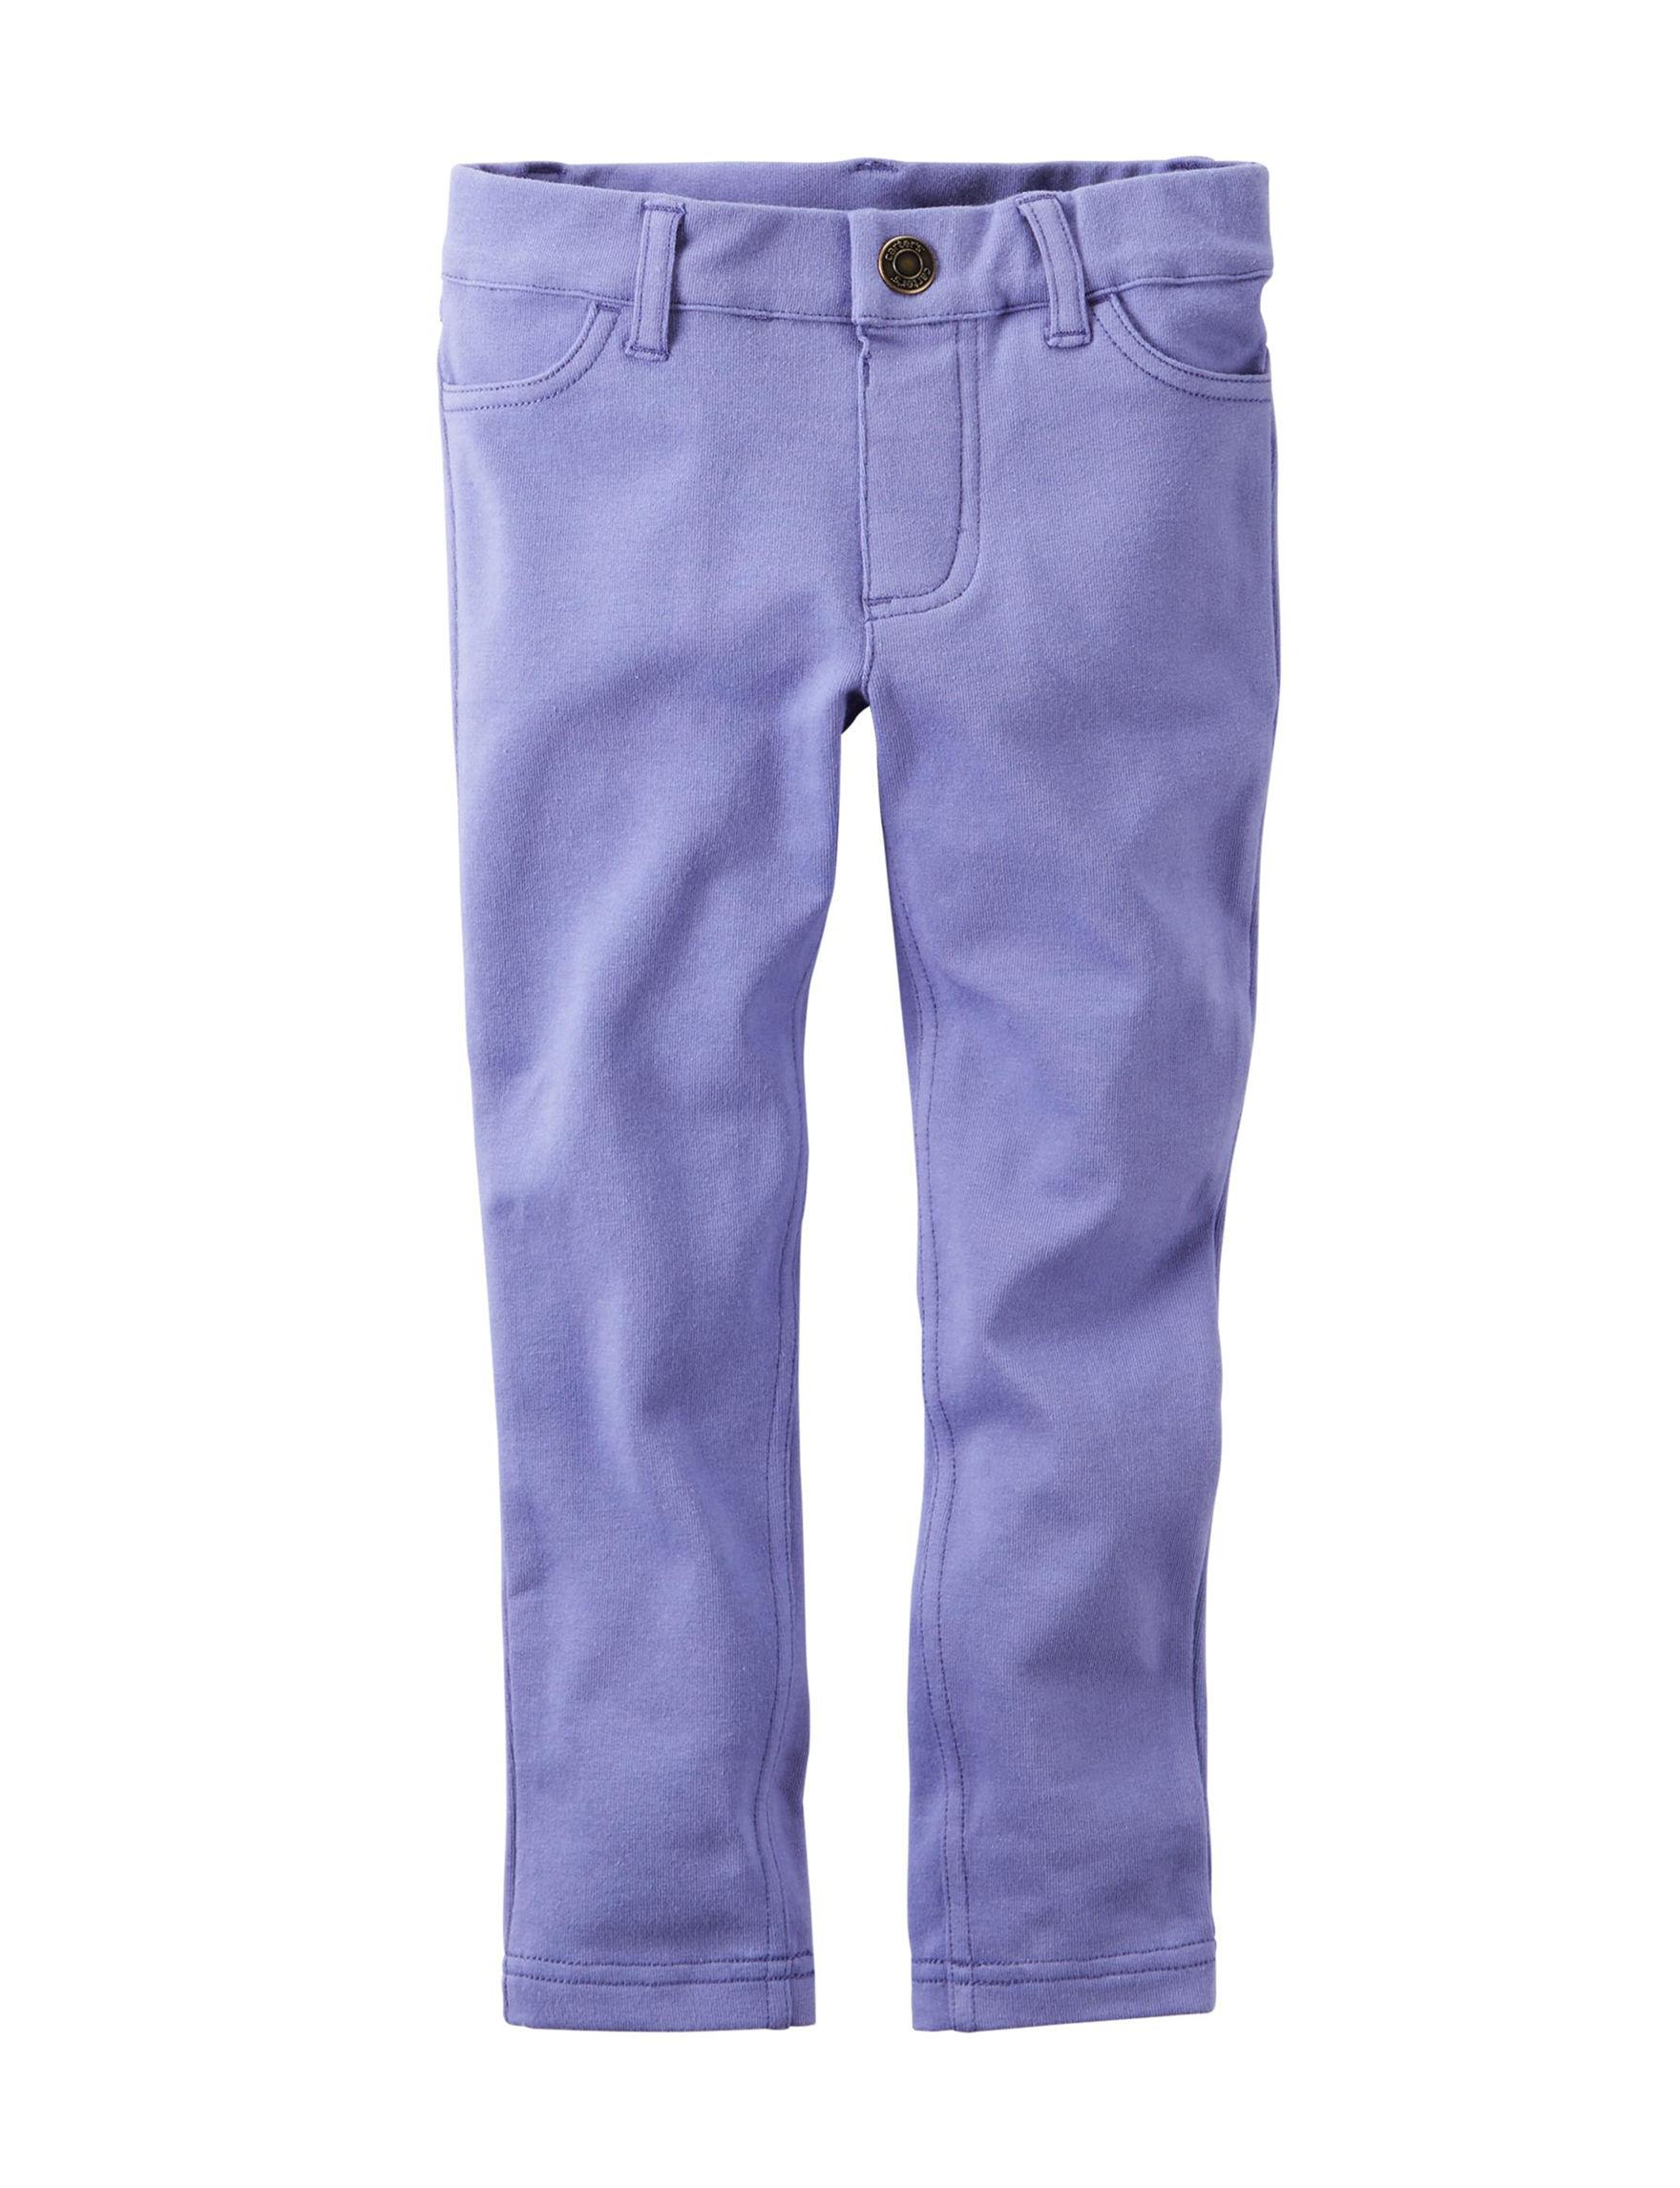 Carter's Purple Regular